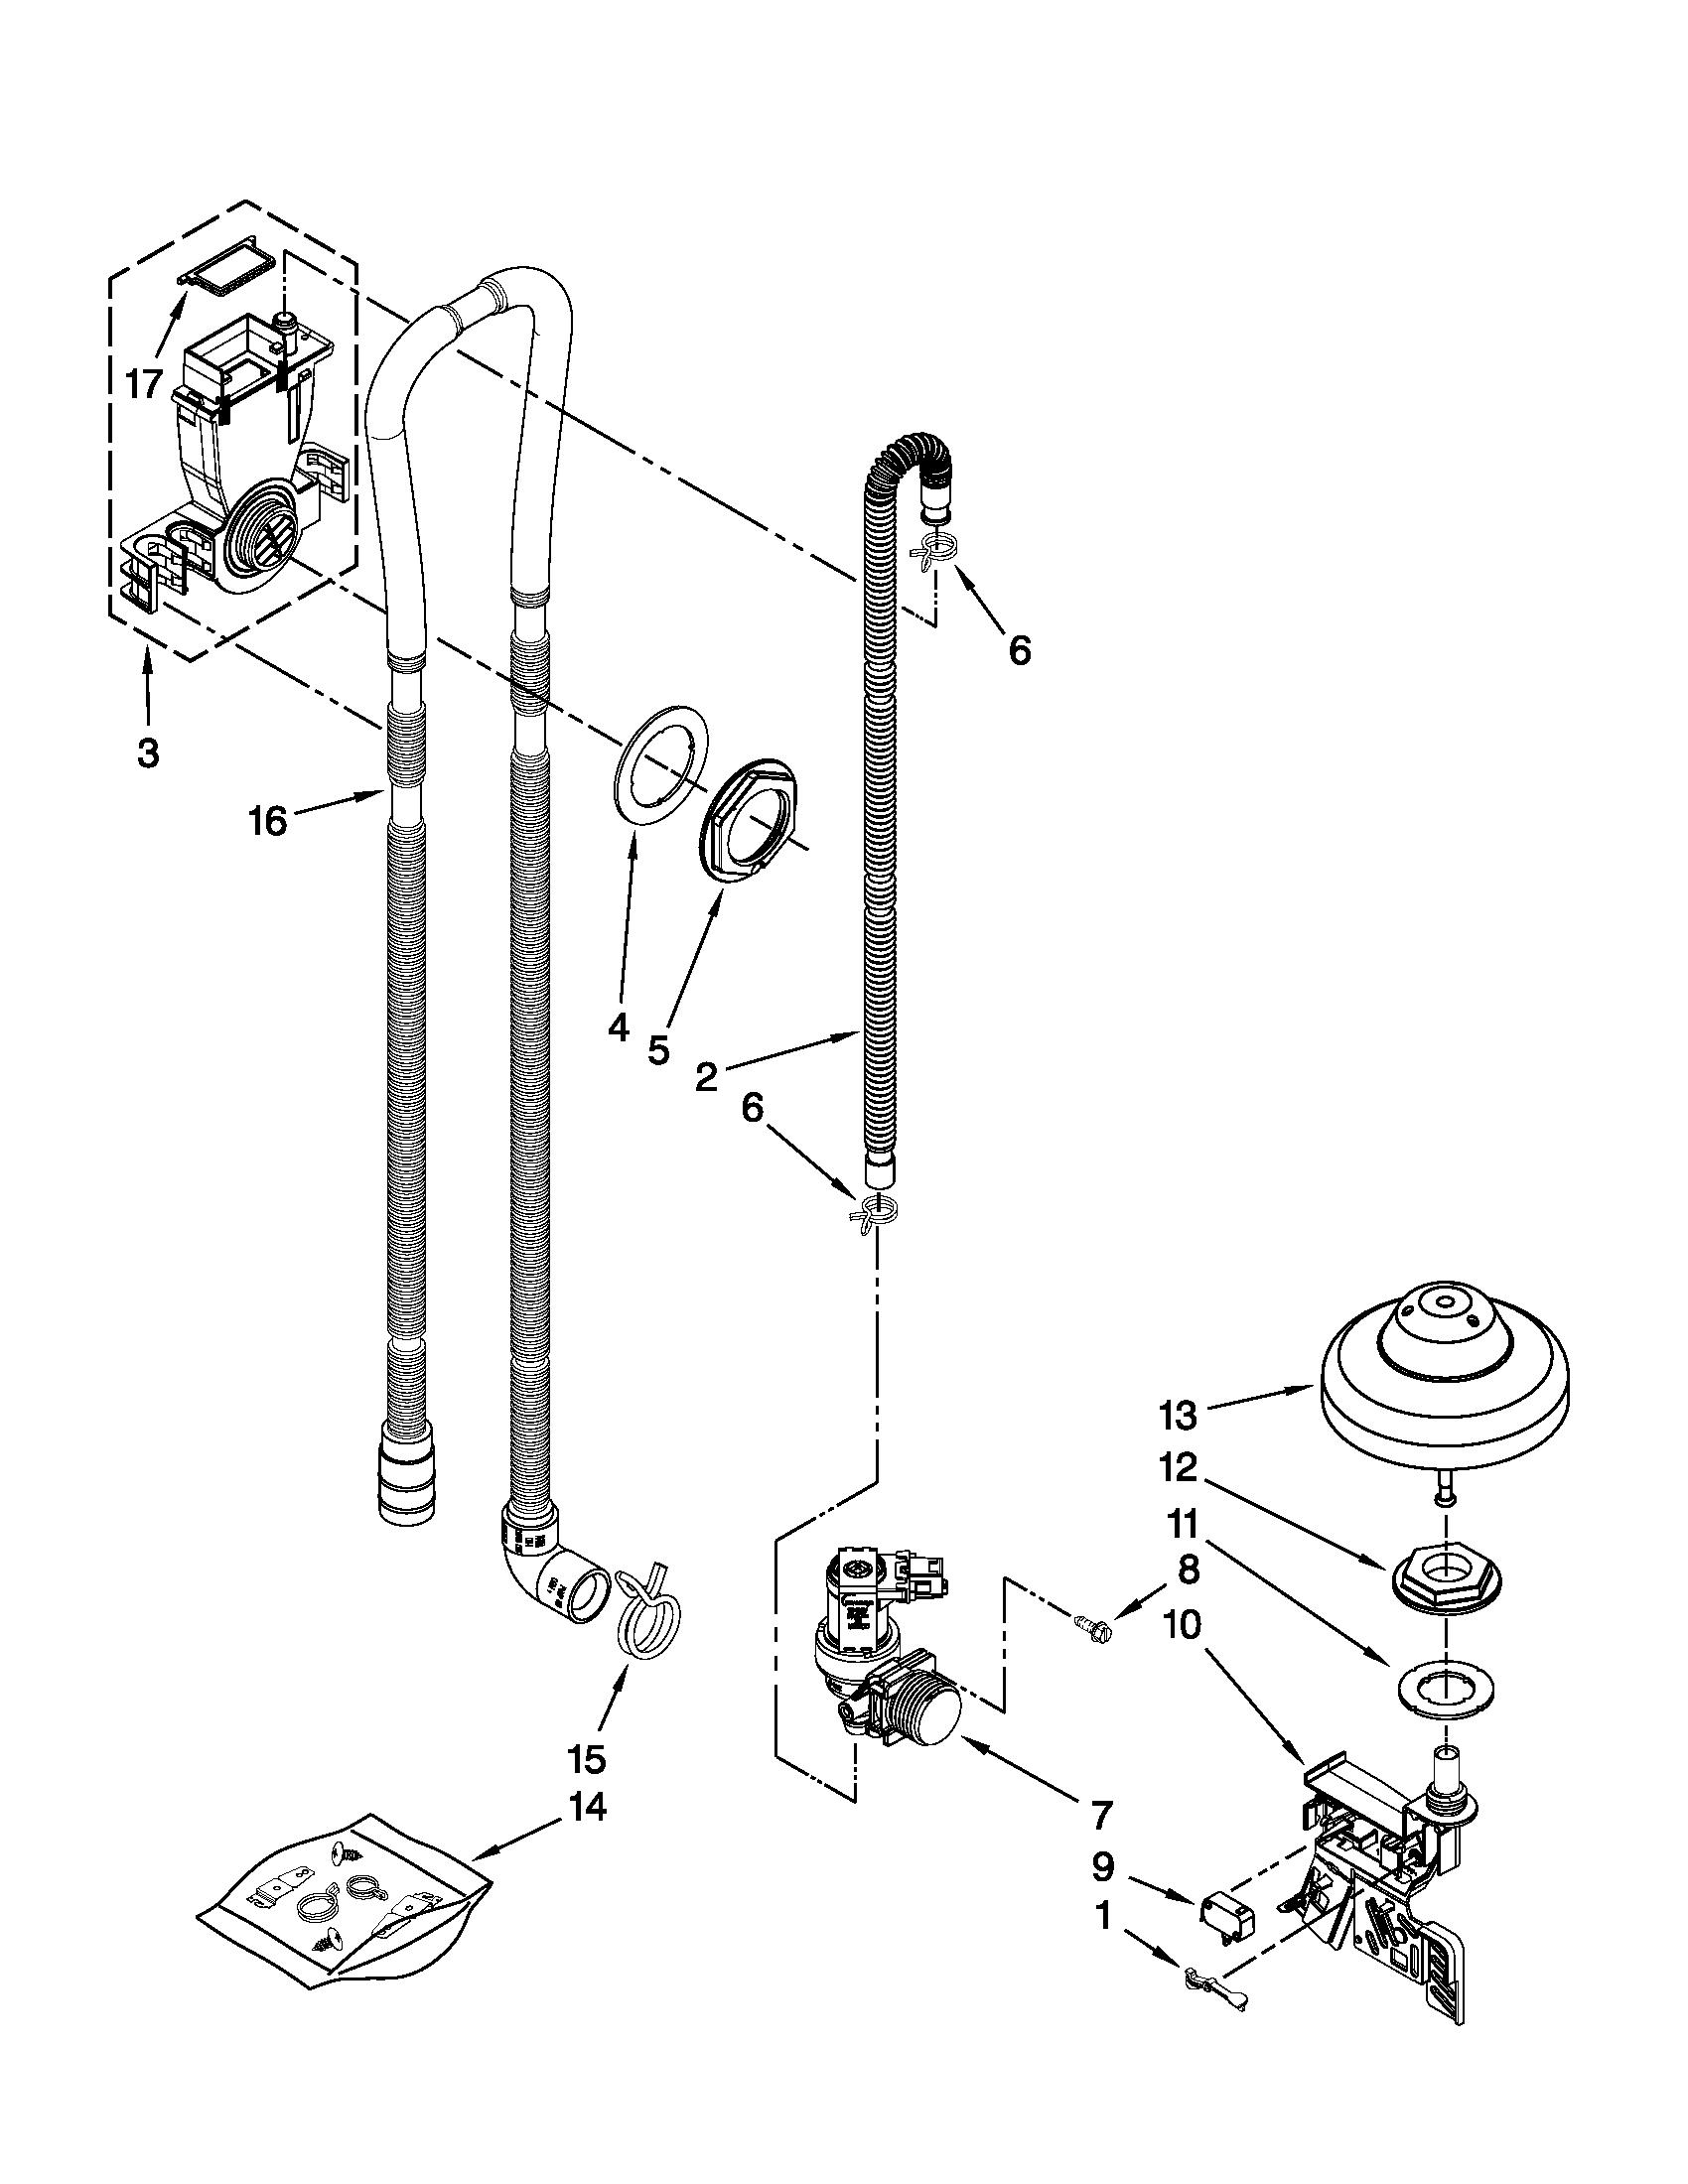 Wiring Diagram: 35 Kitchenaid Dishwasher Parts Diagram